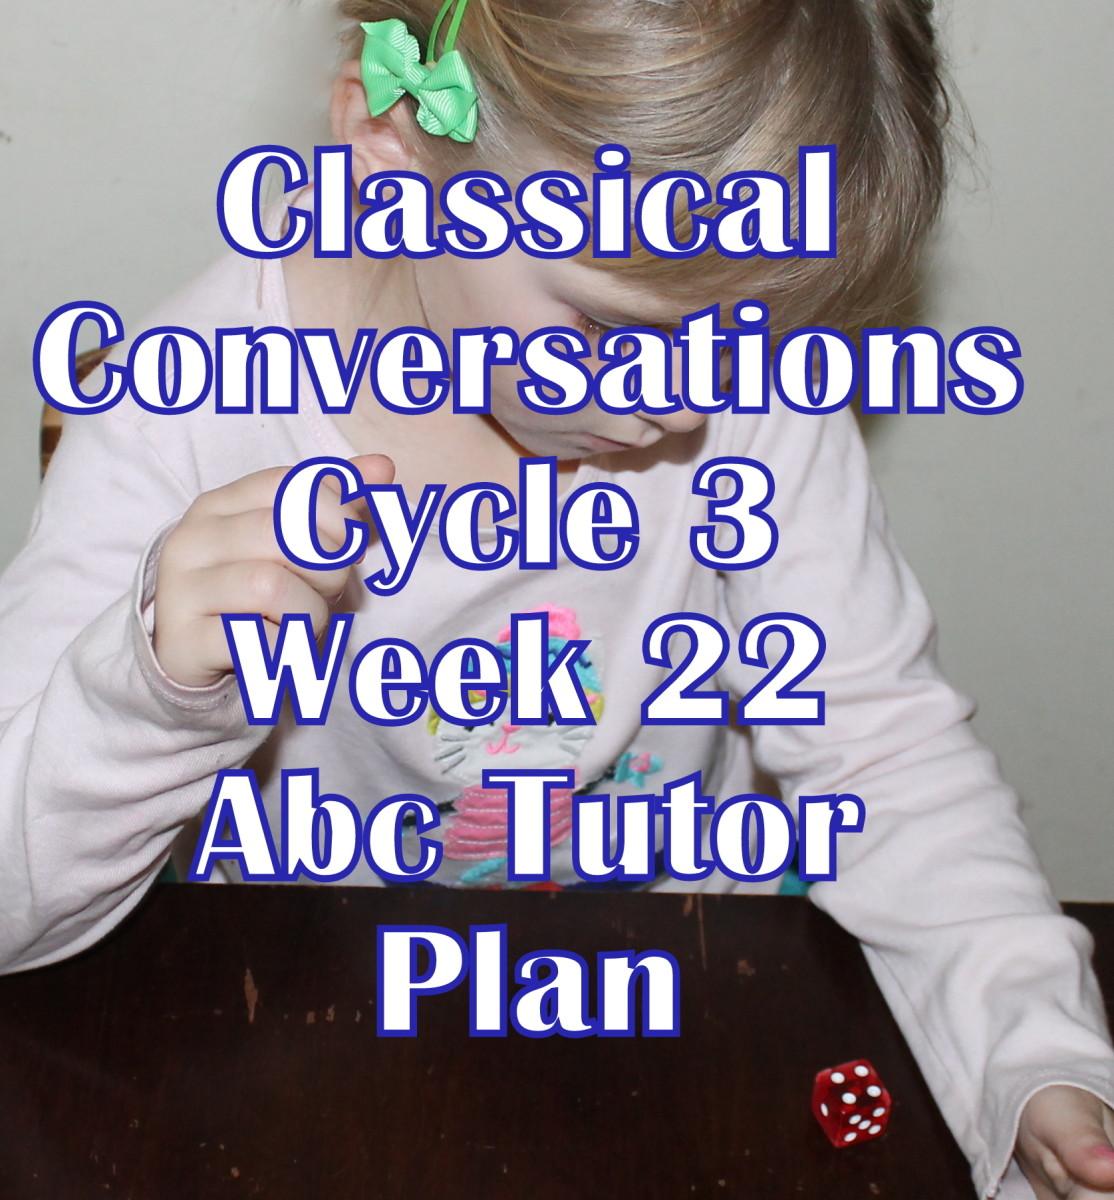 Classical Conversations CC Cycle 3 Week 22 Lesson for Abecedarians - CC C3W22